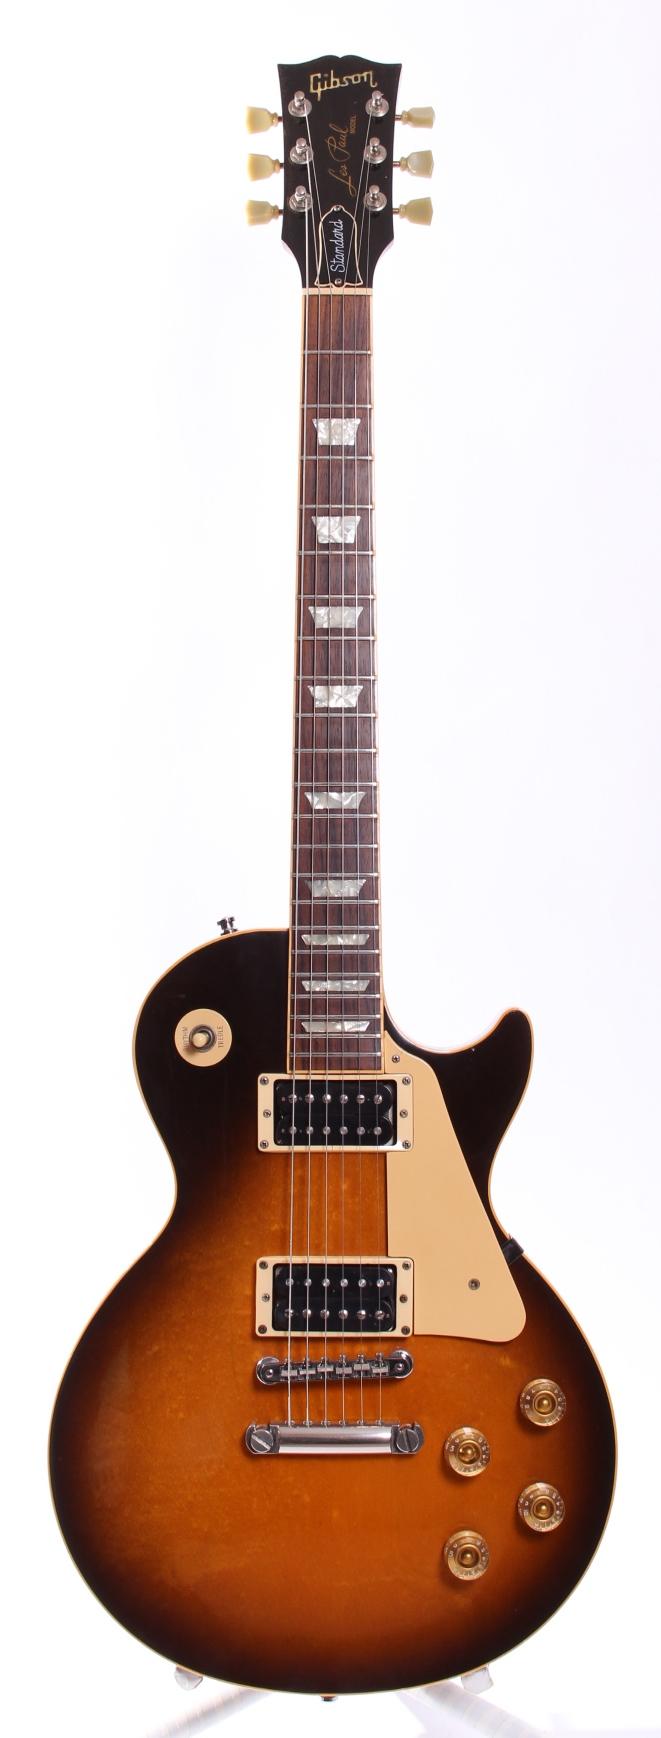 gibson les paul standard 1991 vintage sunburst guitar for sale yeahman 39 s guitars. Black Bedroom Furniture Sets. Home Design Ideas